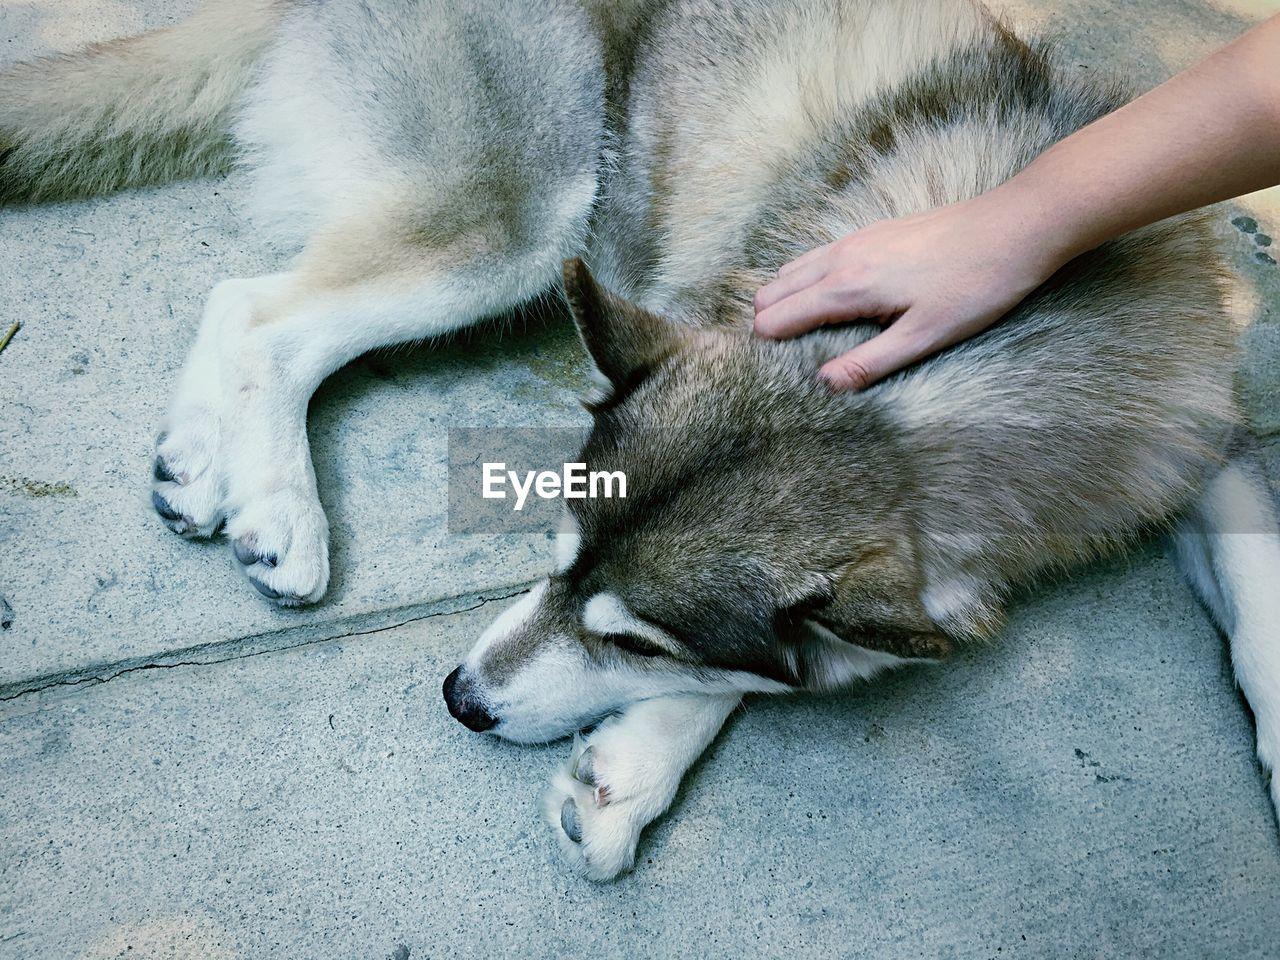 Cropped image of hand on siberian husky